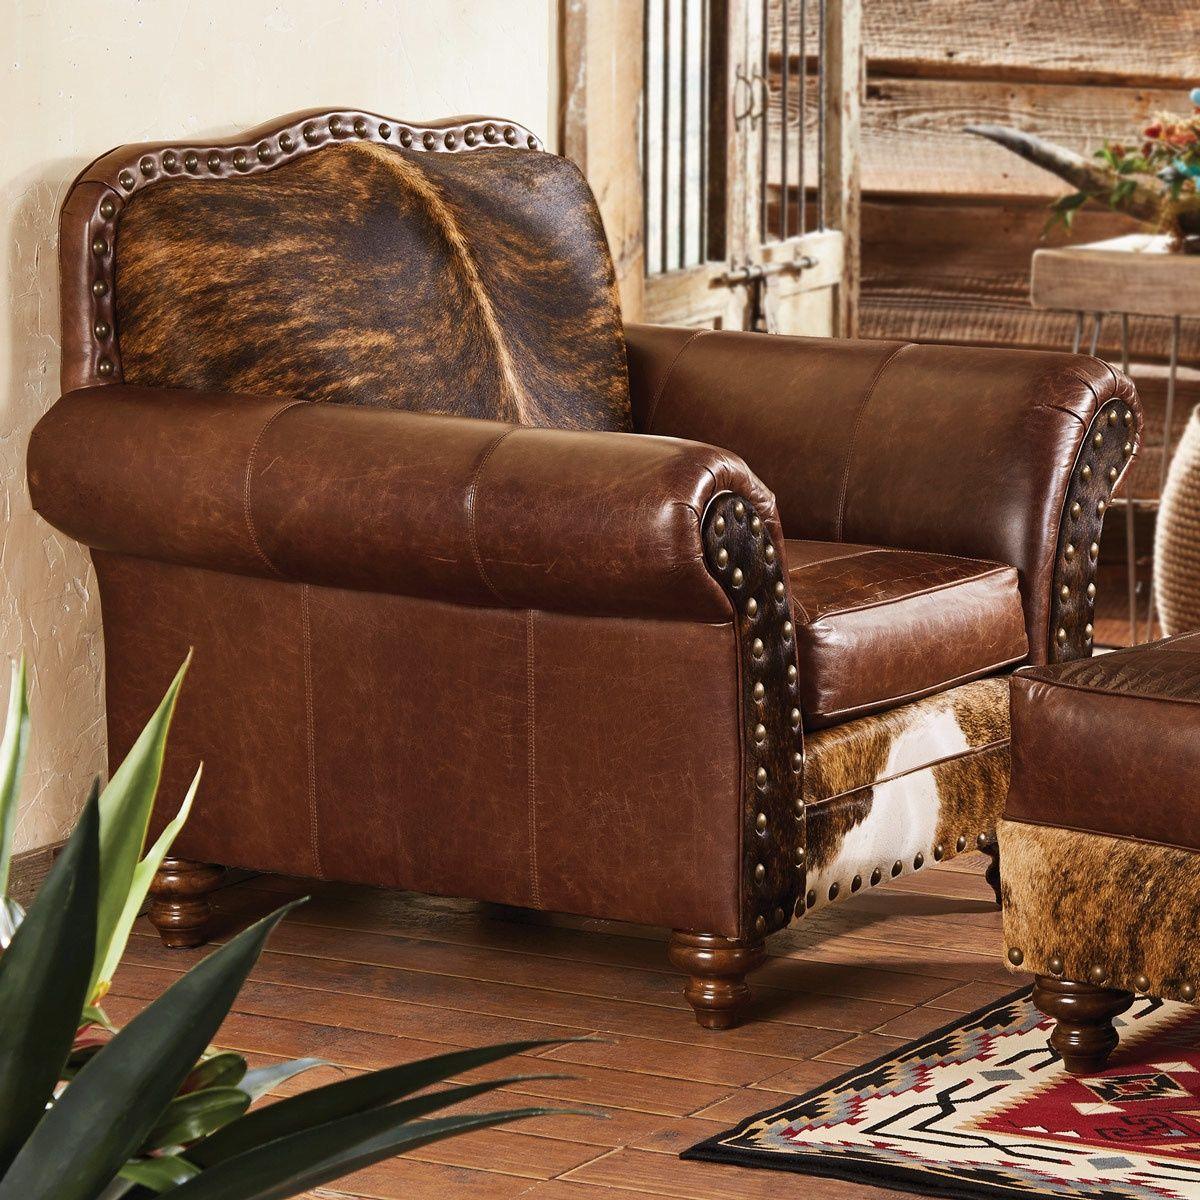 Vaquero Club Chair Western Furniture Club Chairs Country Furniture